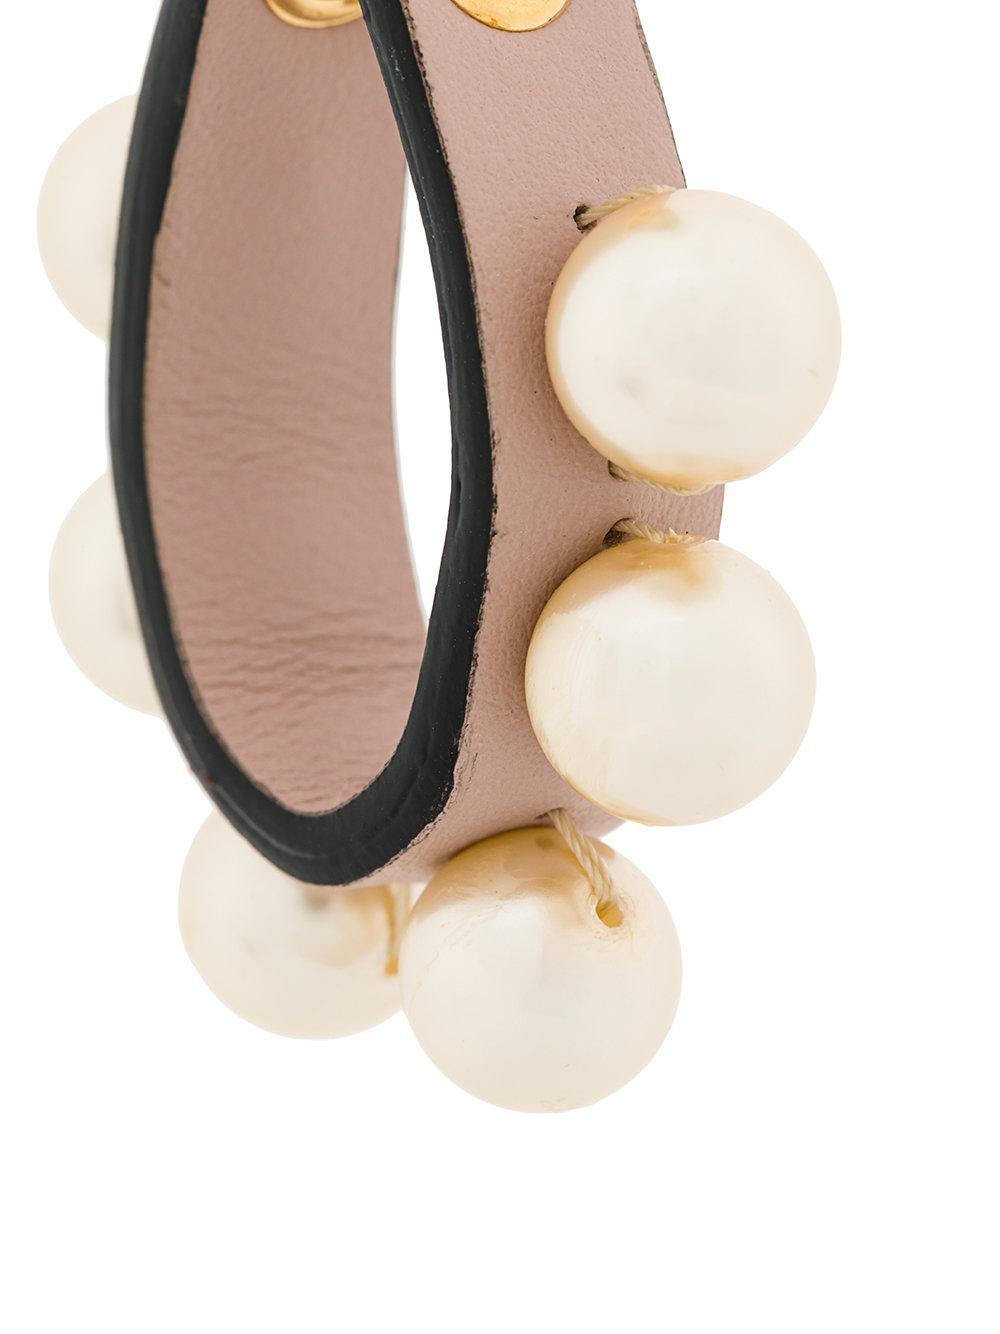 pearl leather earrings - Black Marni xB7DB5P